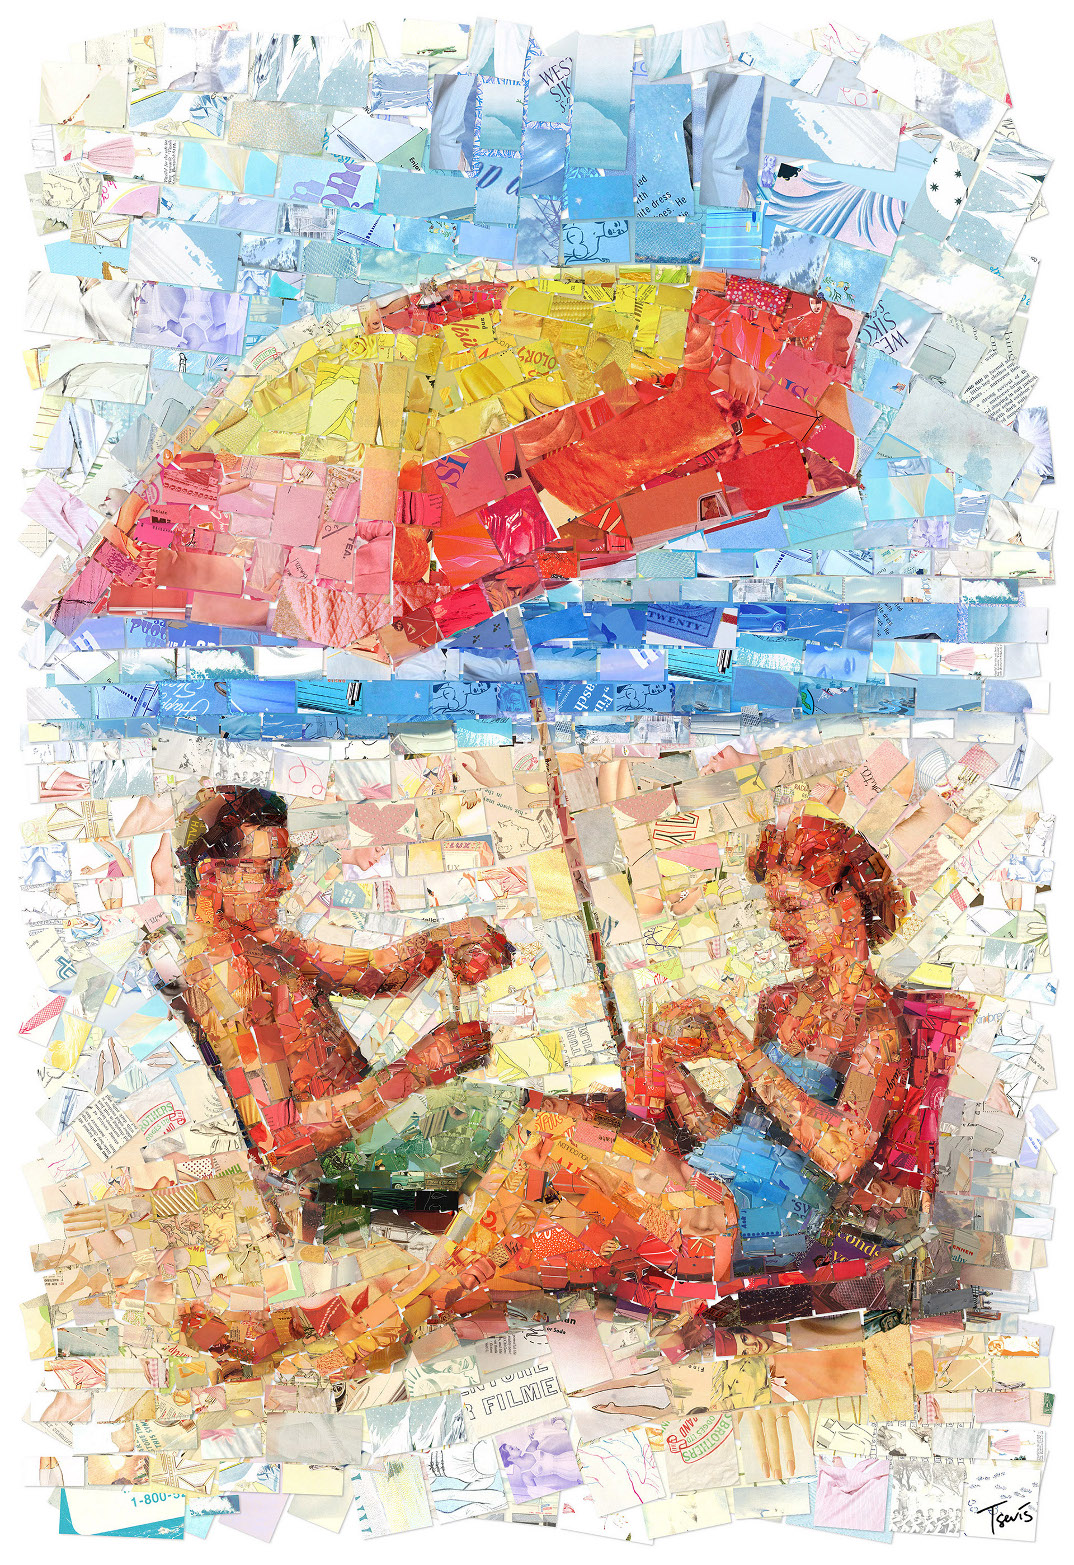 mosaici-collage-riviste-anni-50-60-endless-summer-charis-tsevis-10